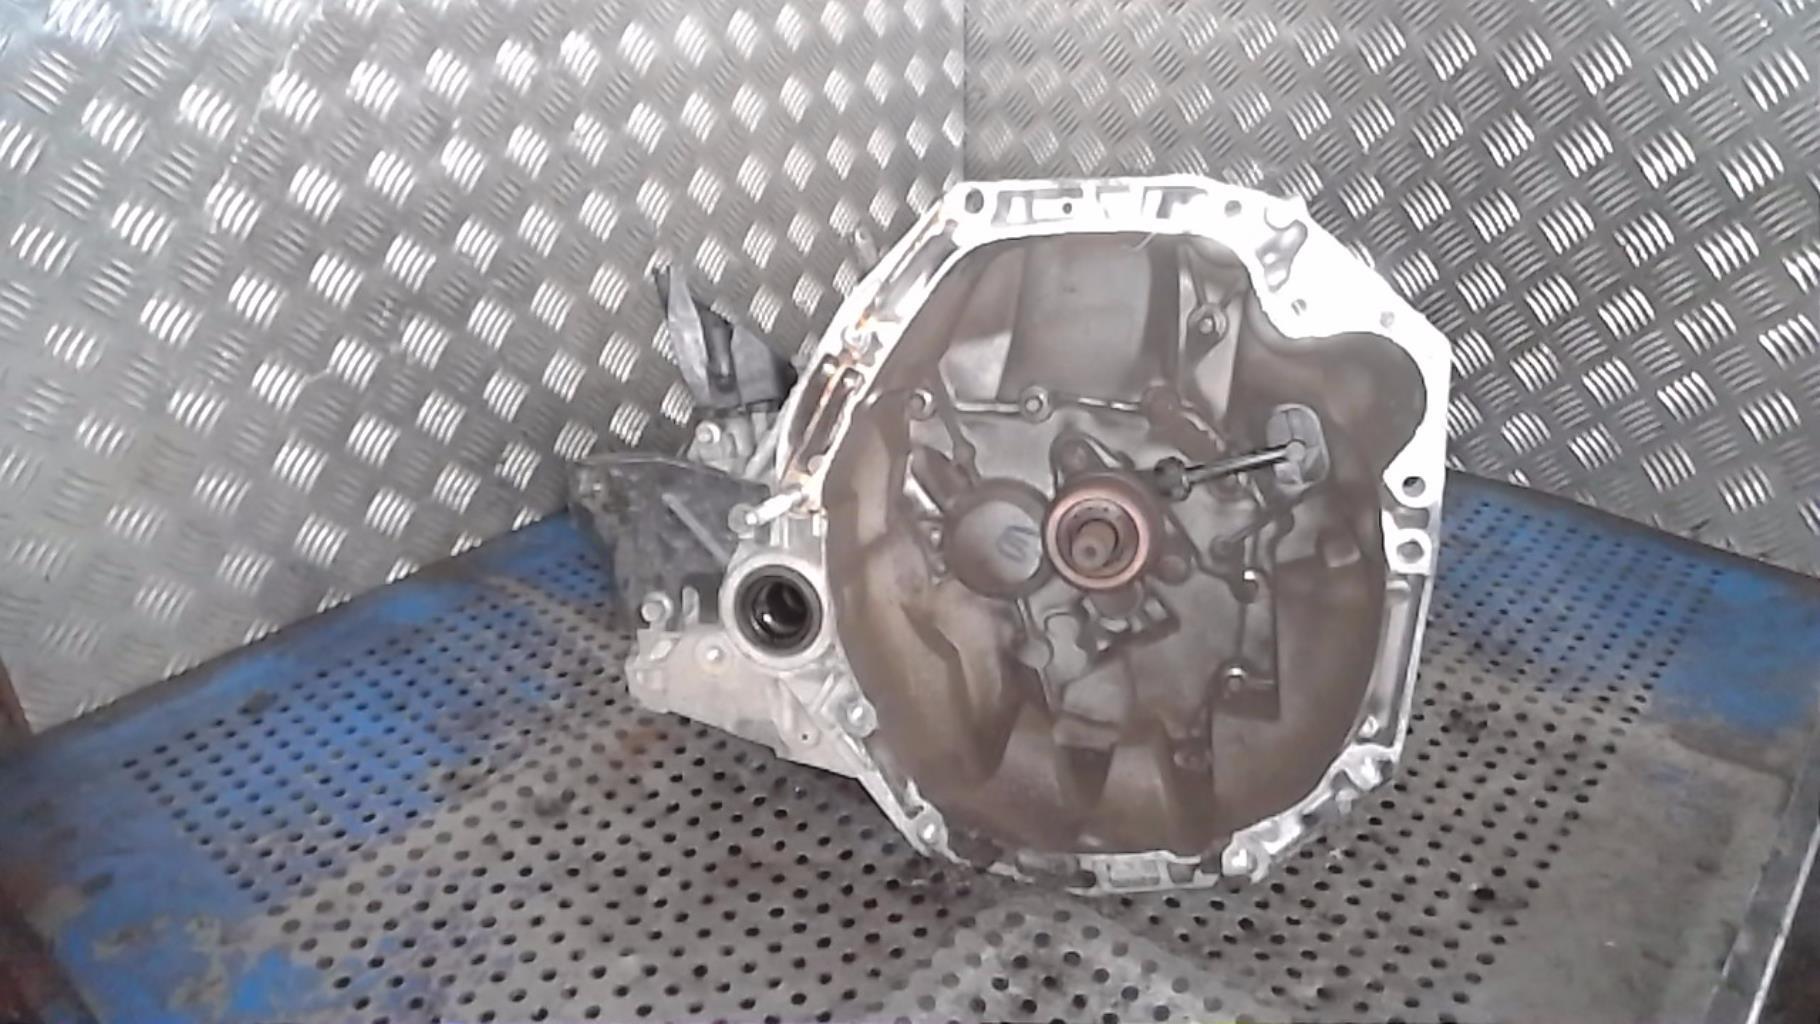 Boite de vitesses RENAULT CLIO 3 PHASE 2 Diesel